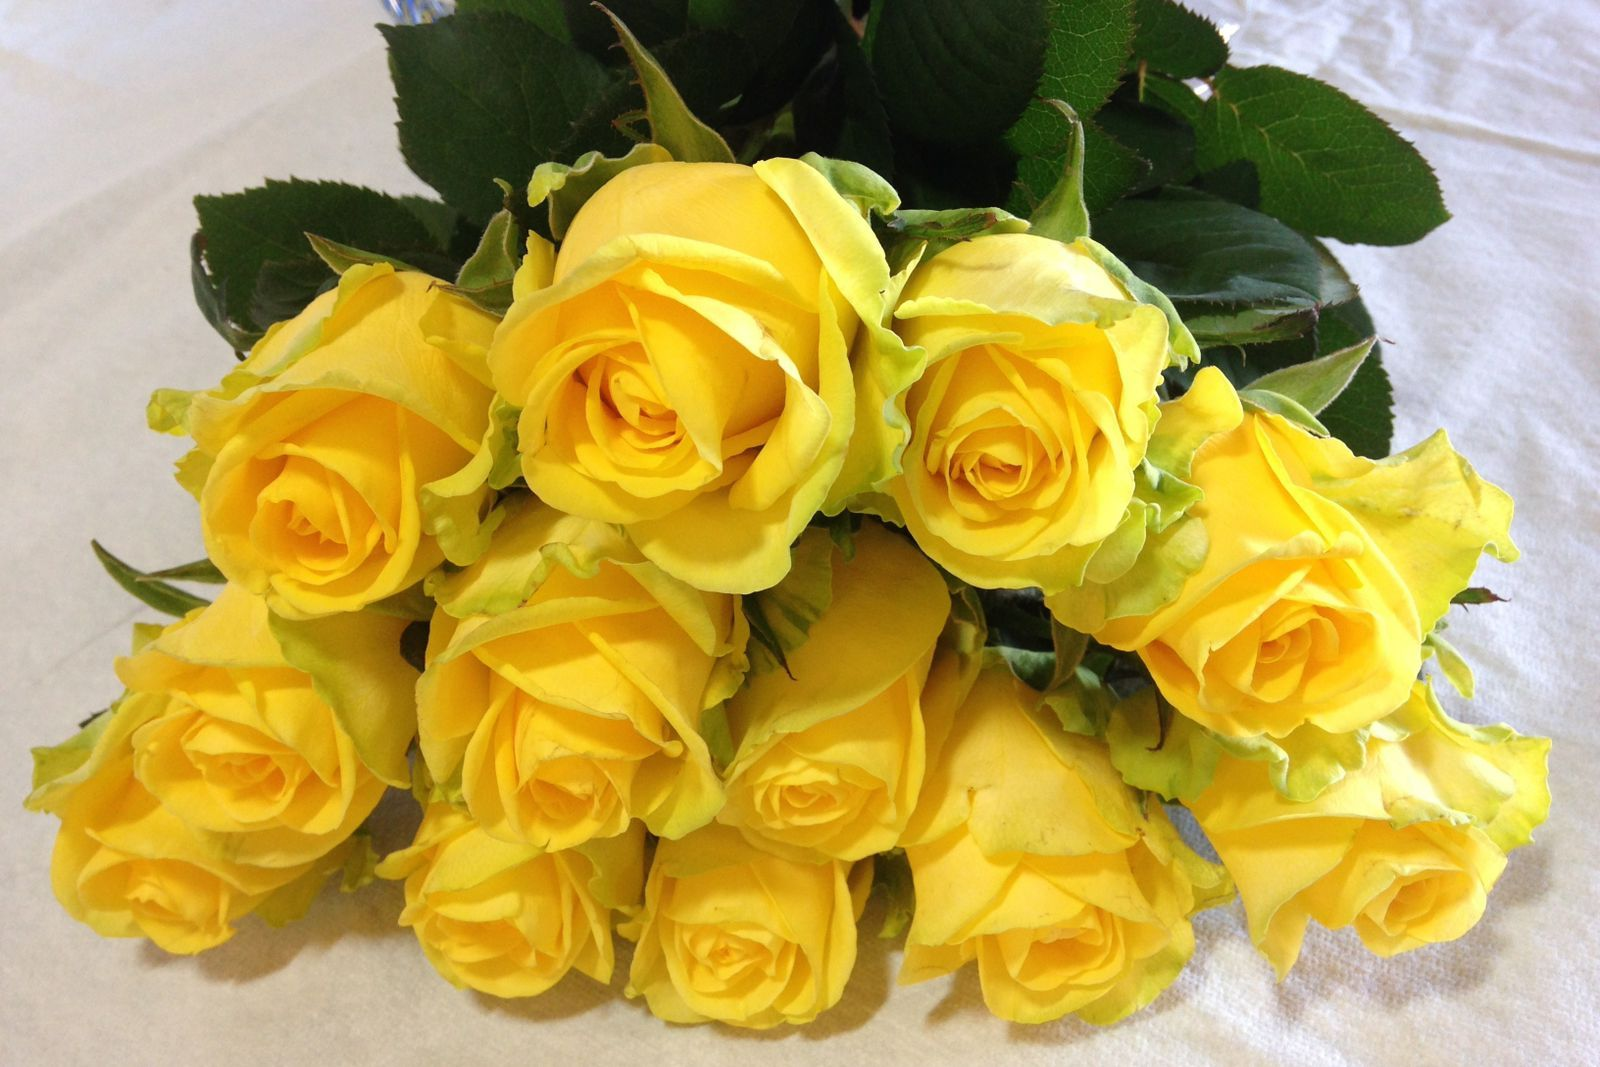 Ред наоми роза фото